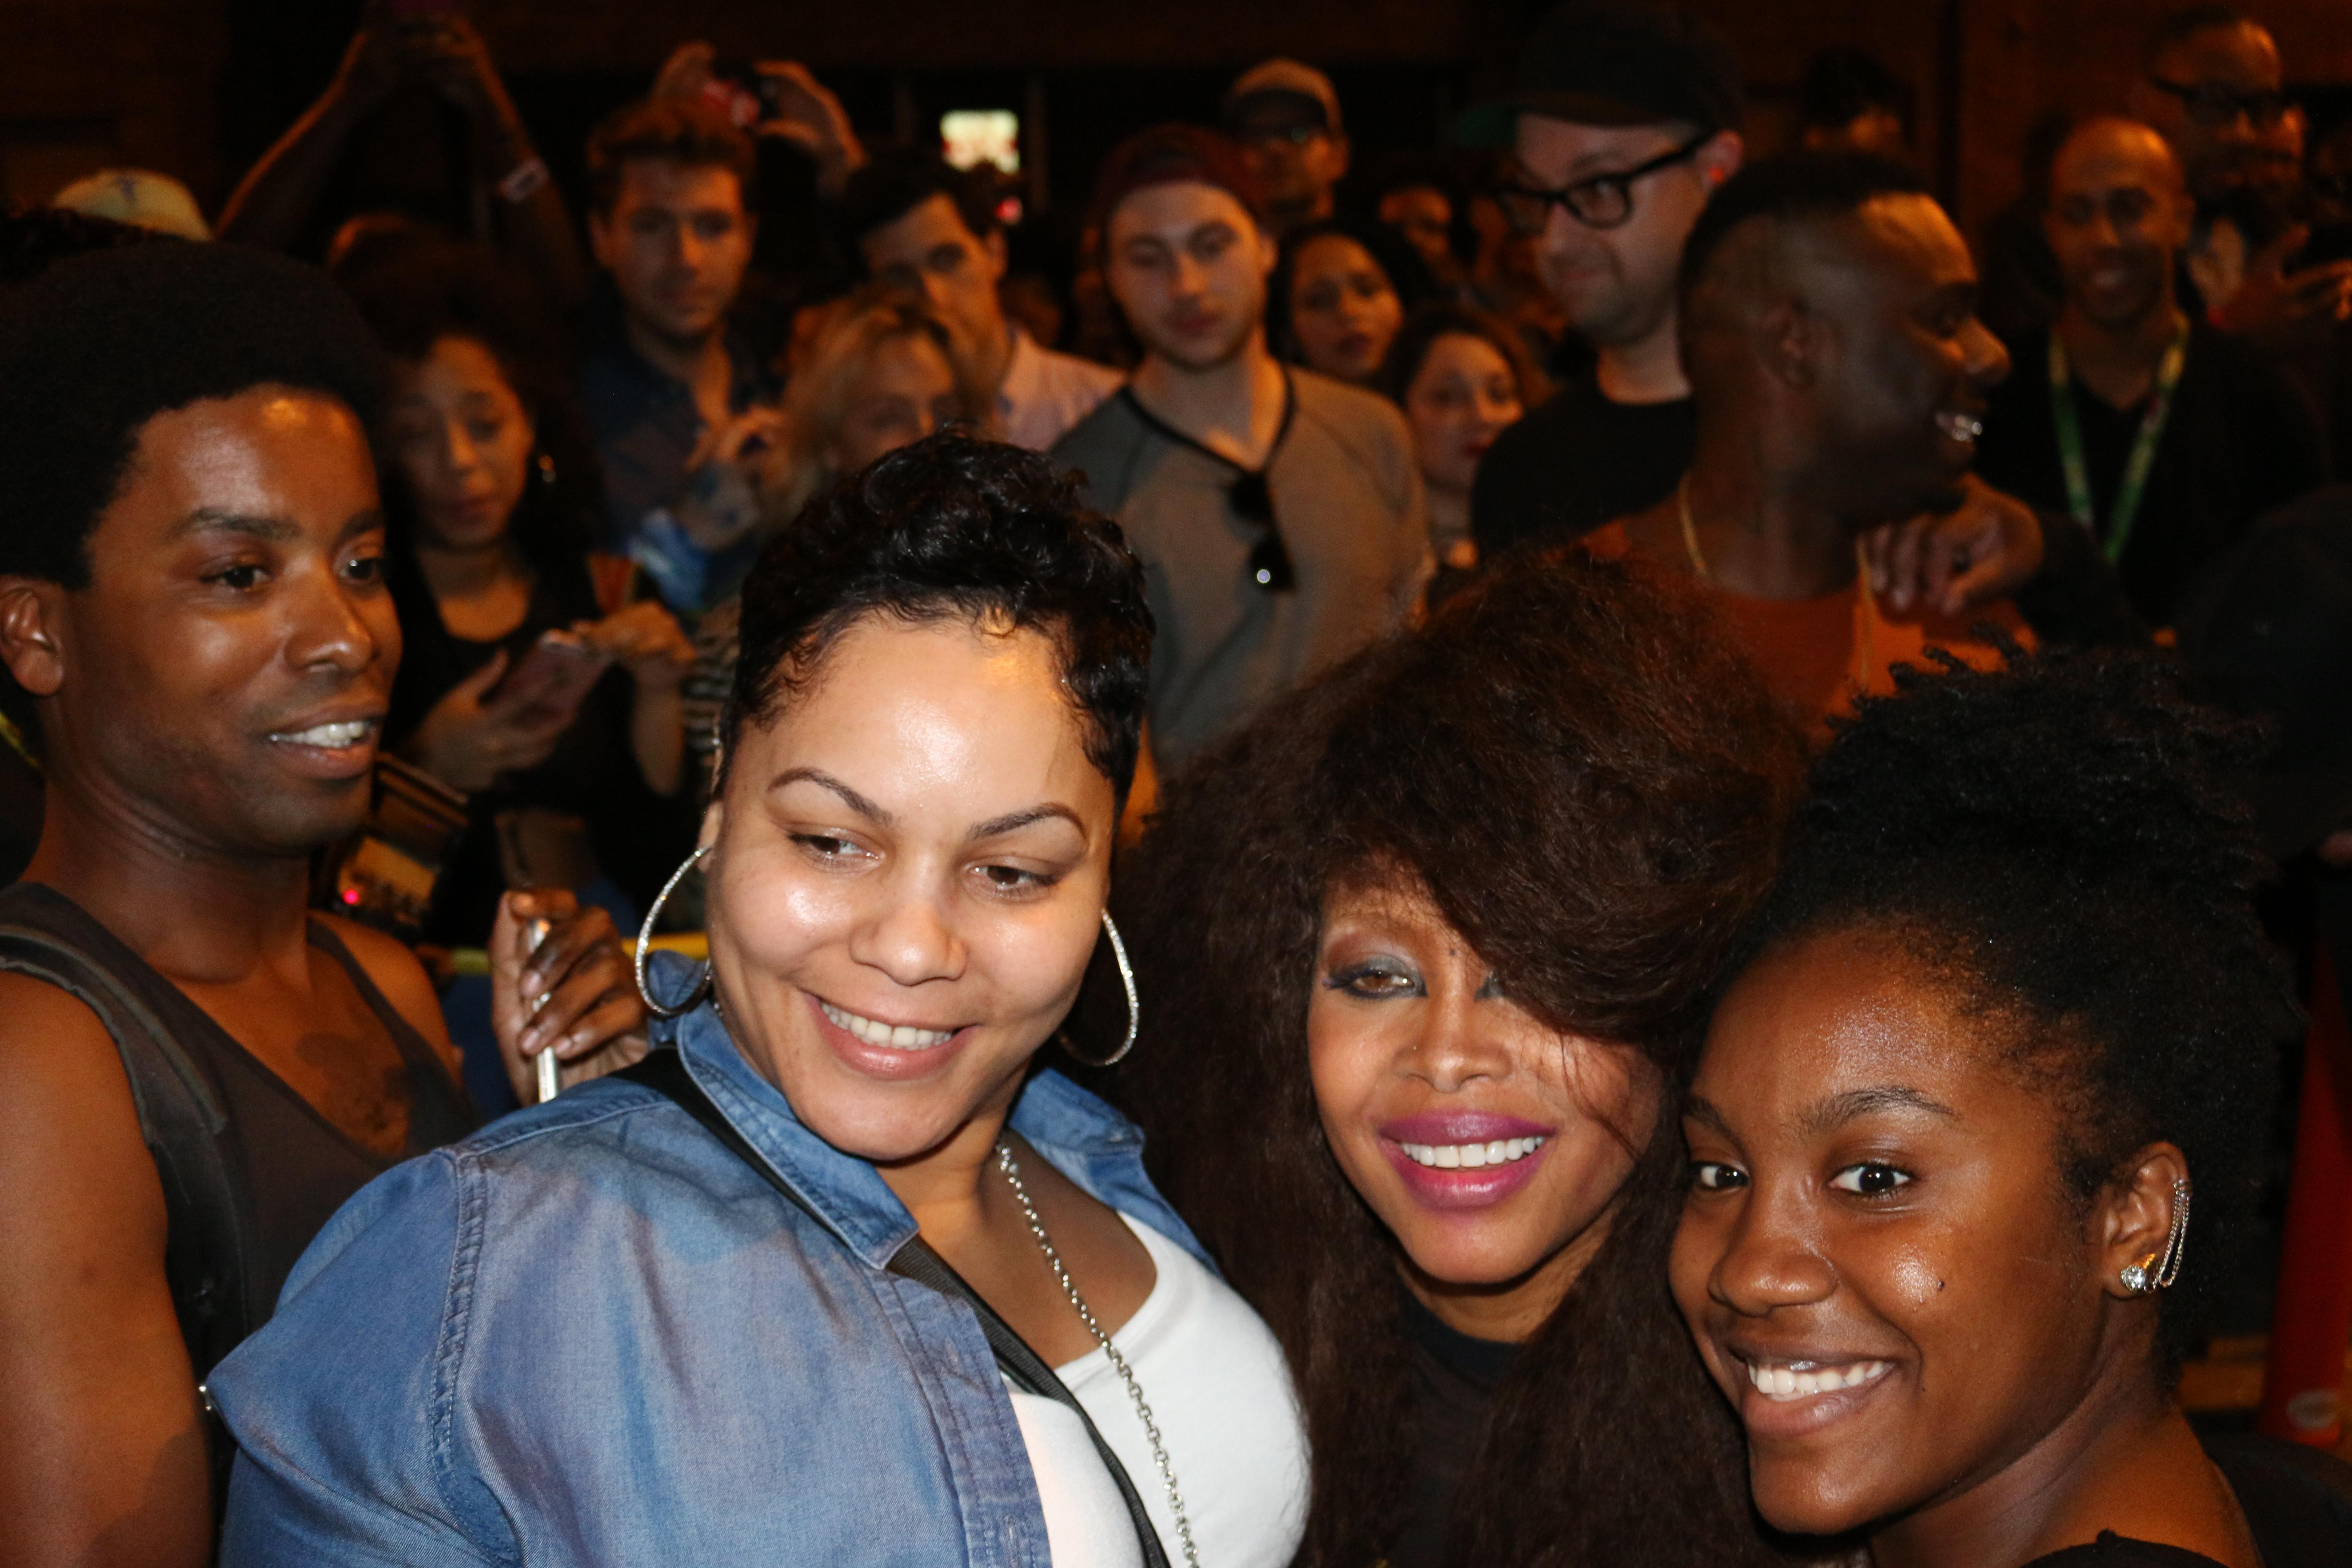 Erykah Badu and fans